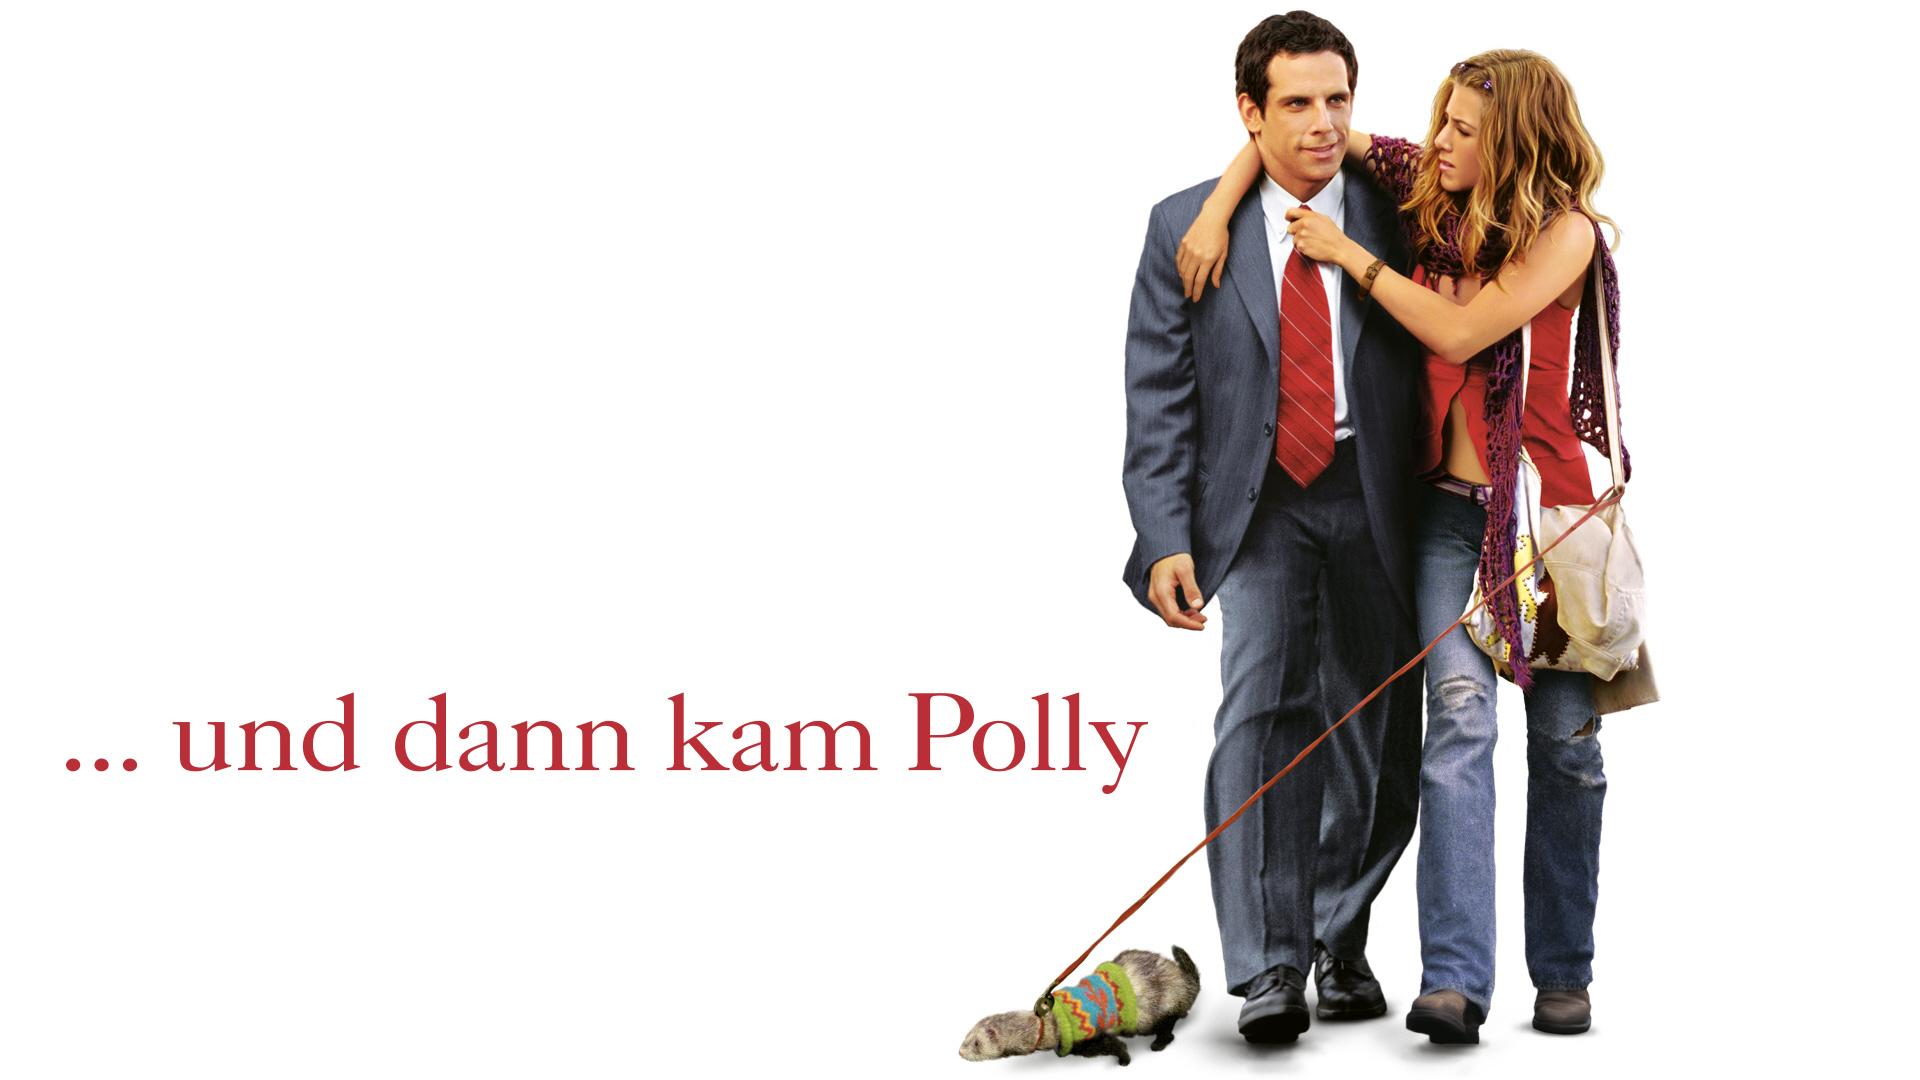 Dann Kam Polly